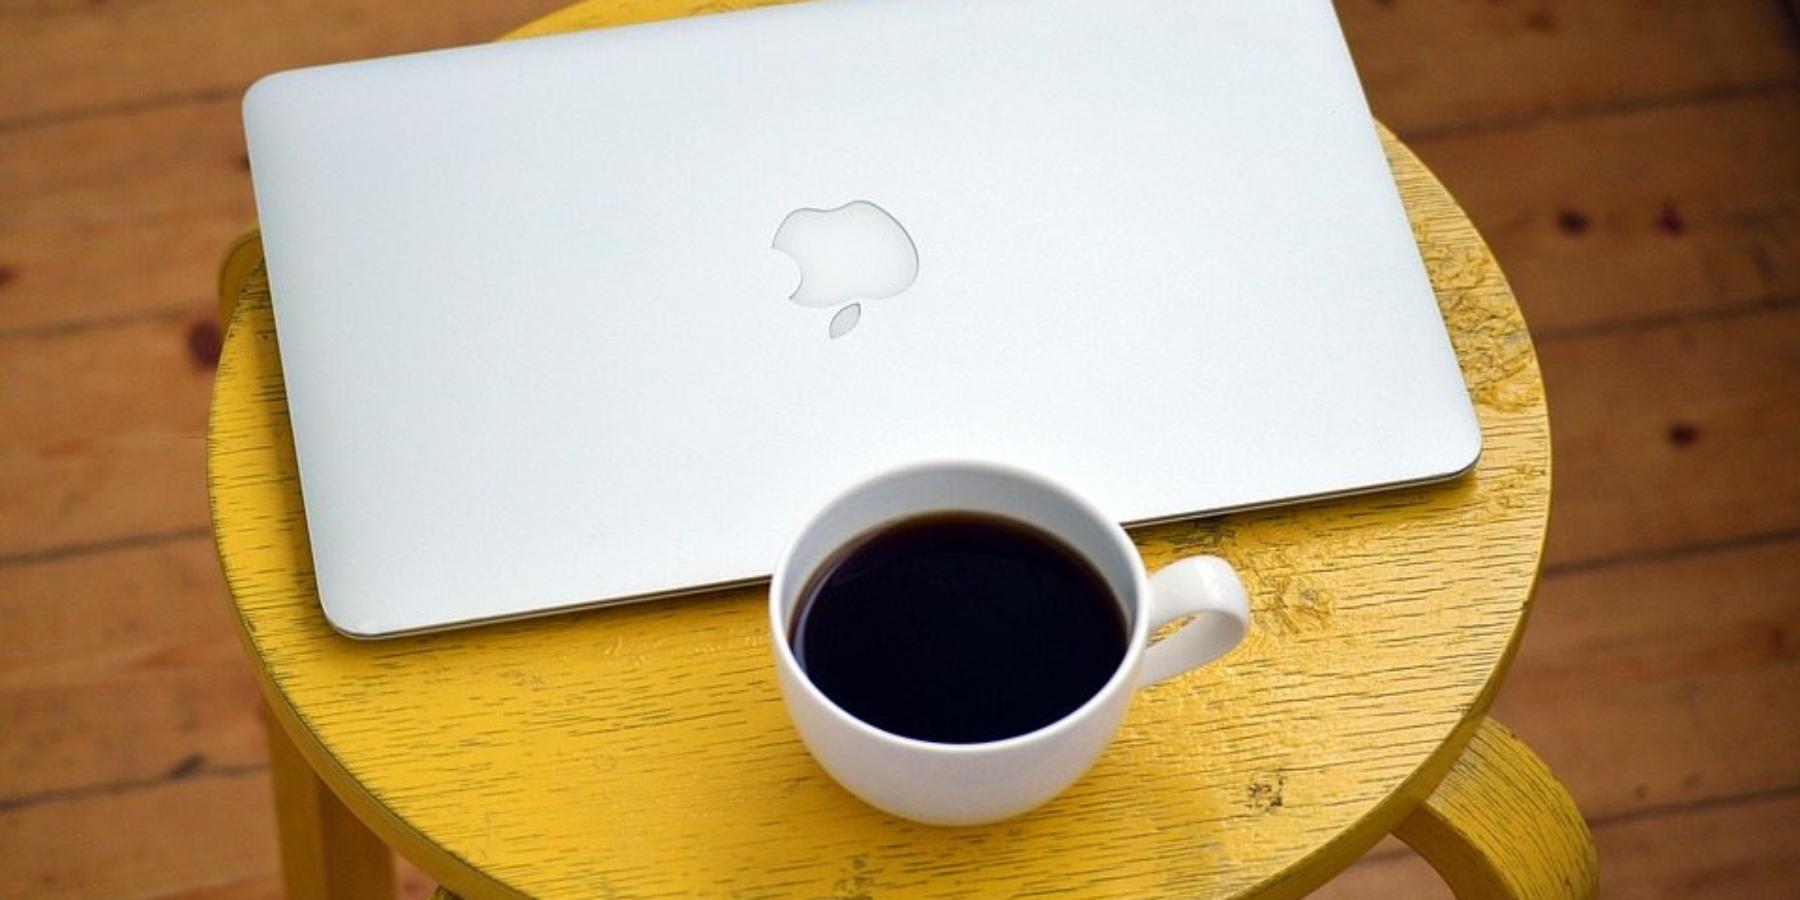 Delikatesy spożywcze iwizerunek eksperta – Jak content marketing buduje markę?